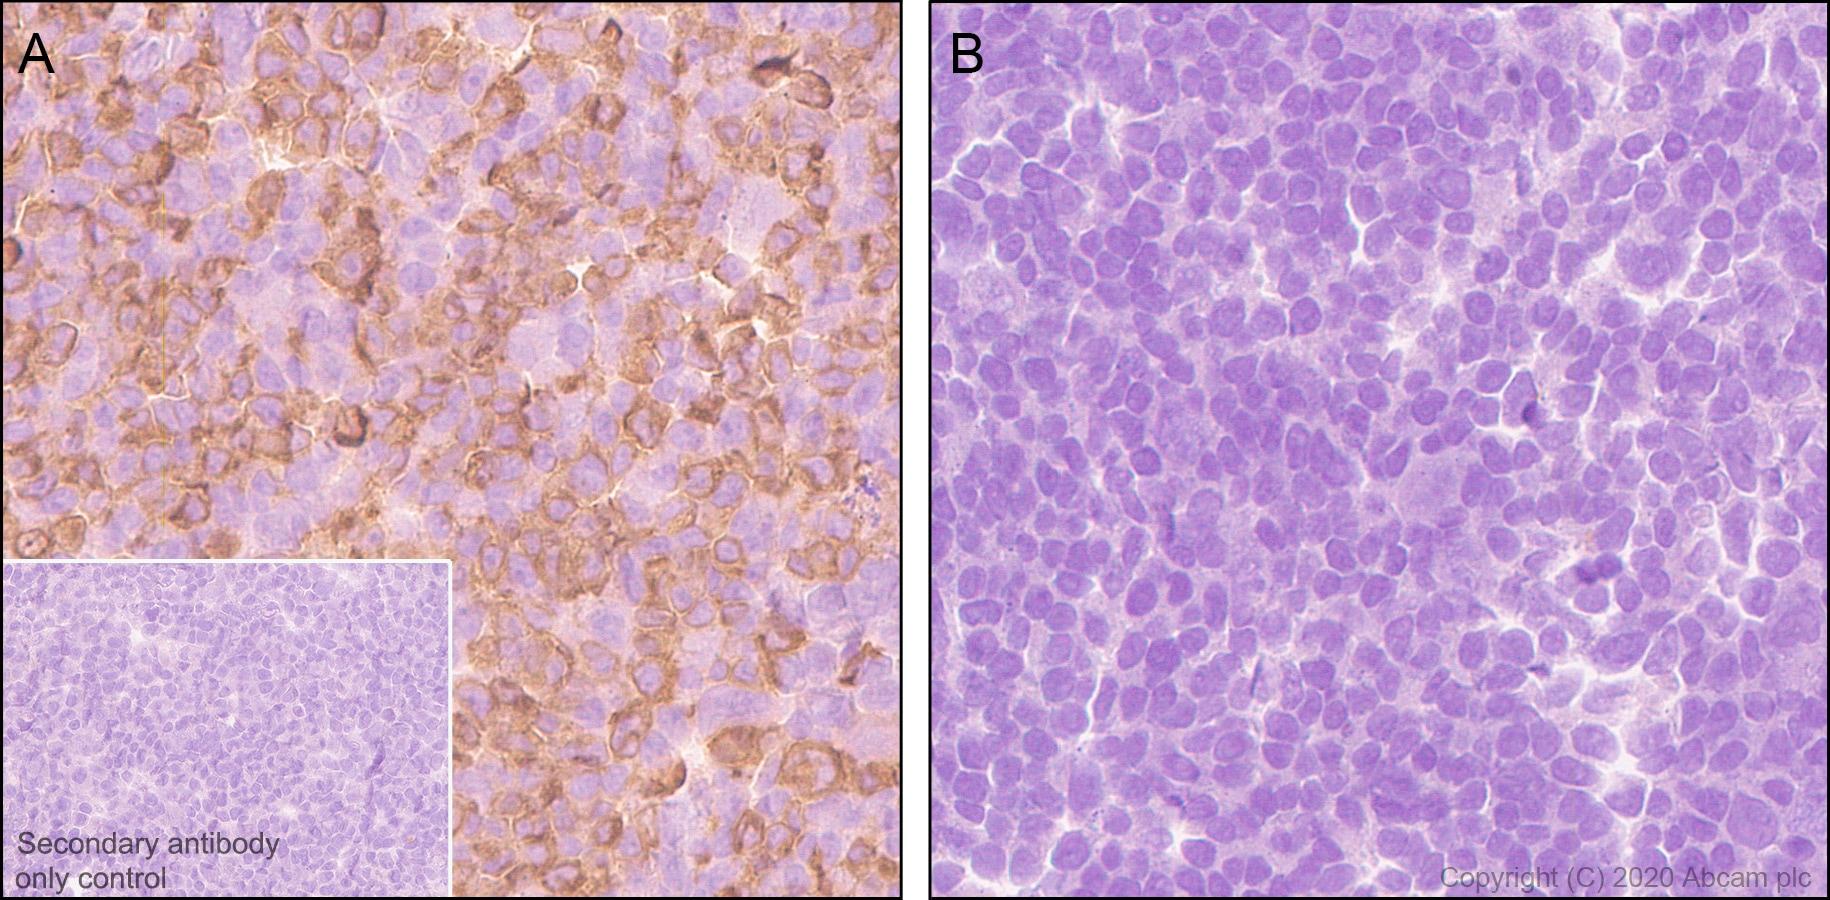 Immunohistochemistry (Formalin/PFA-fixed paraffin-embedded sections) - Anti-TVA antibody [PICA187E] (ab271292)